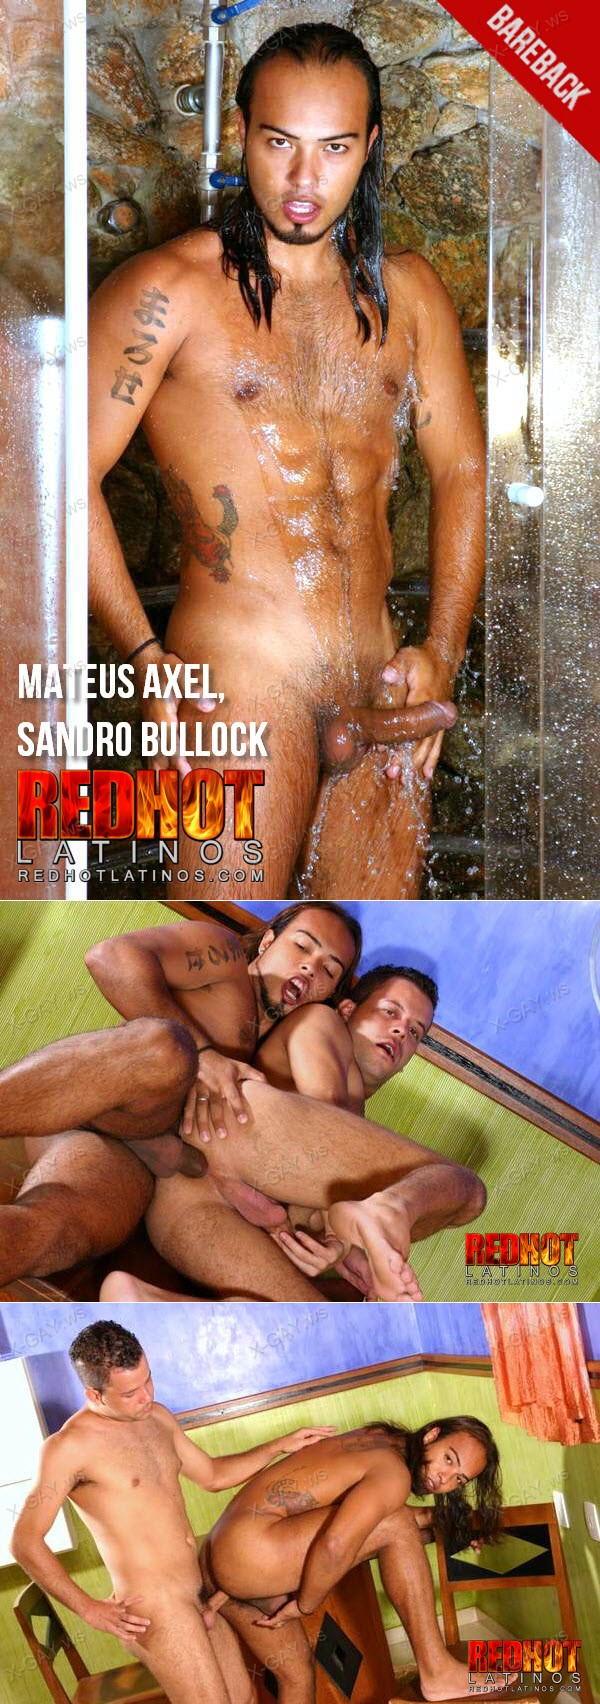 RedhotLatinos: Mateus Axel, Sandro Bullock (Bareback Flip Flop)